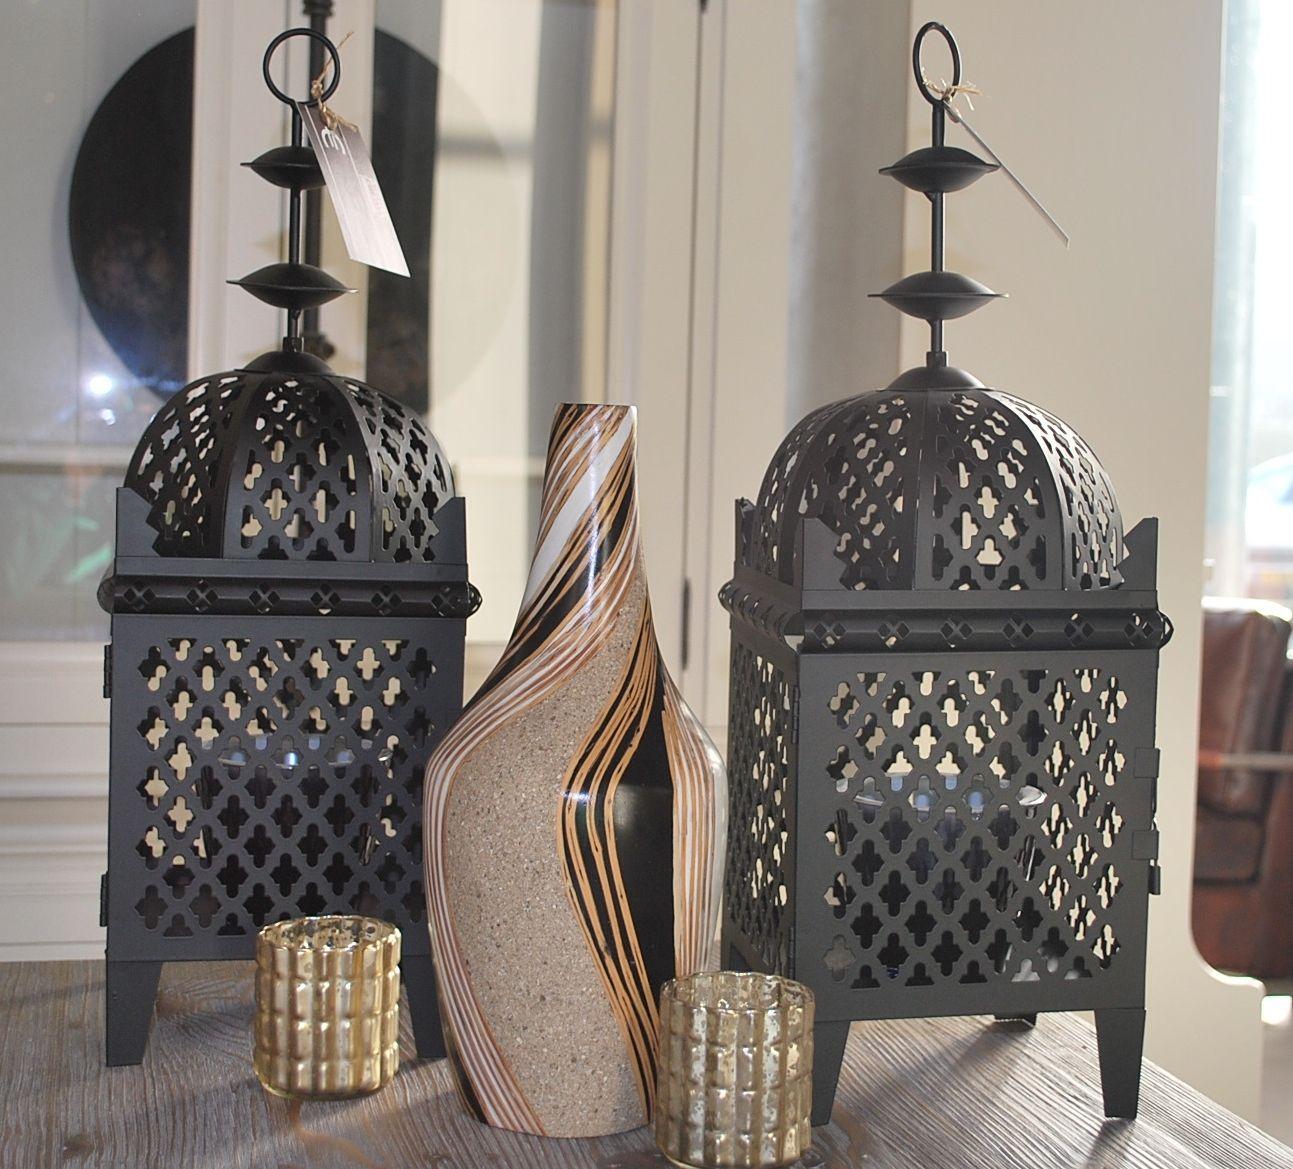 Lantaarns #lantaarn #interieur #interior #interieurwinkel #interiorstore #meubelsenmeer #mijdrecht #vaas #kaarsjes #kaars #lantaarn #inrichting #sfeer #black